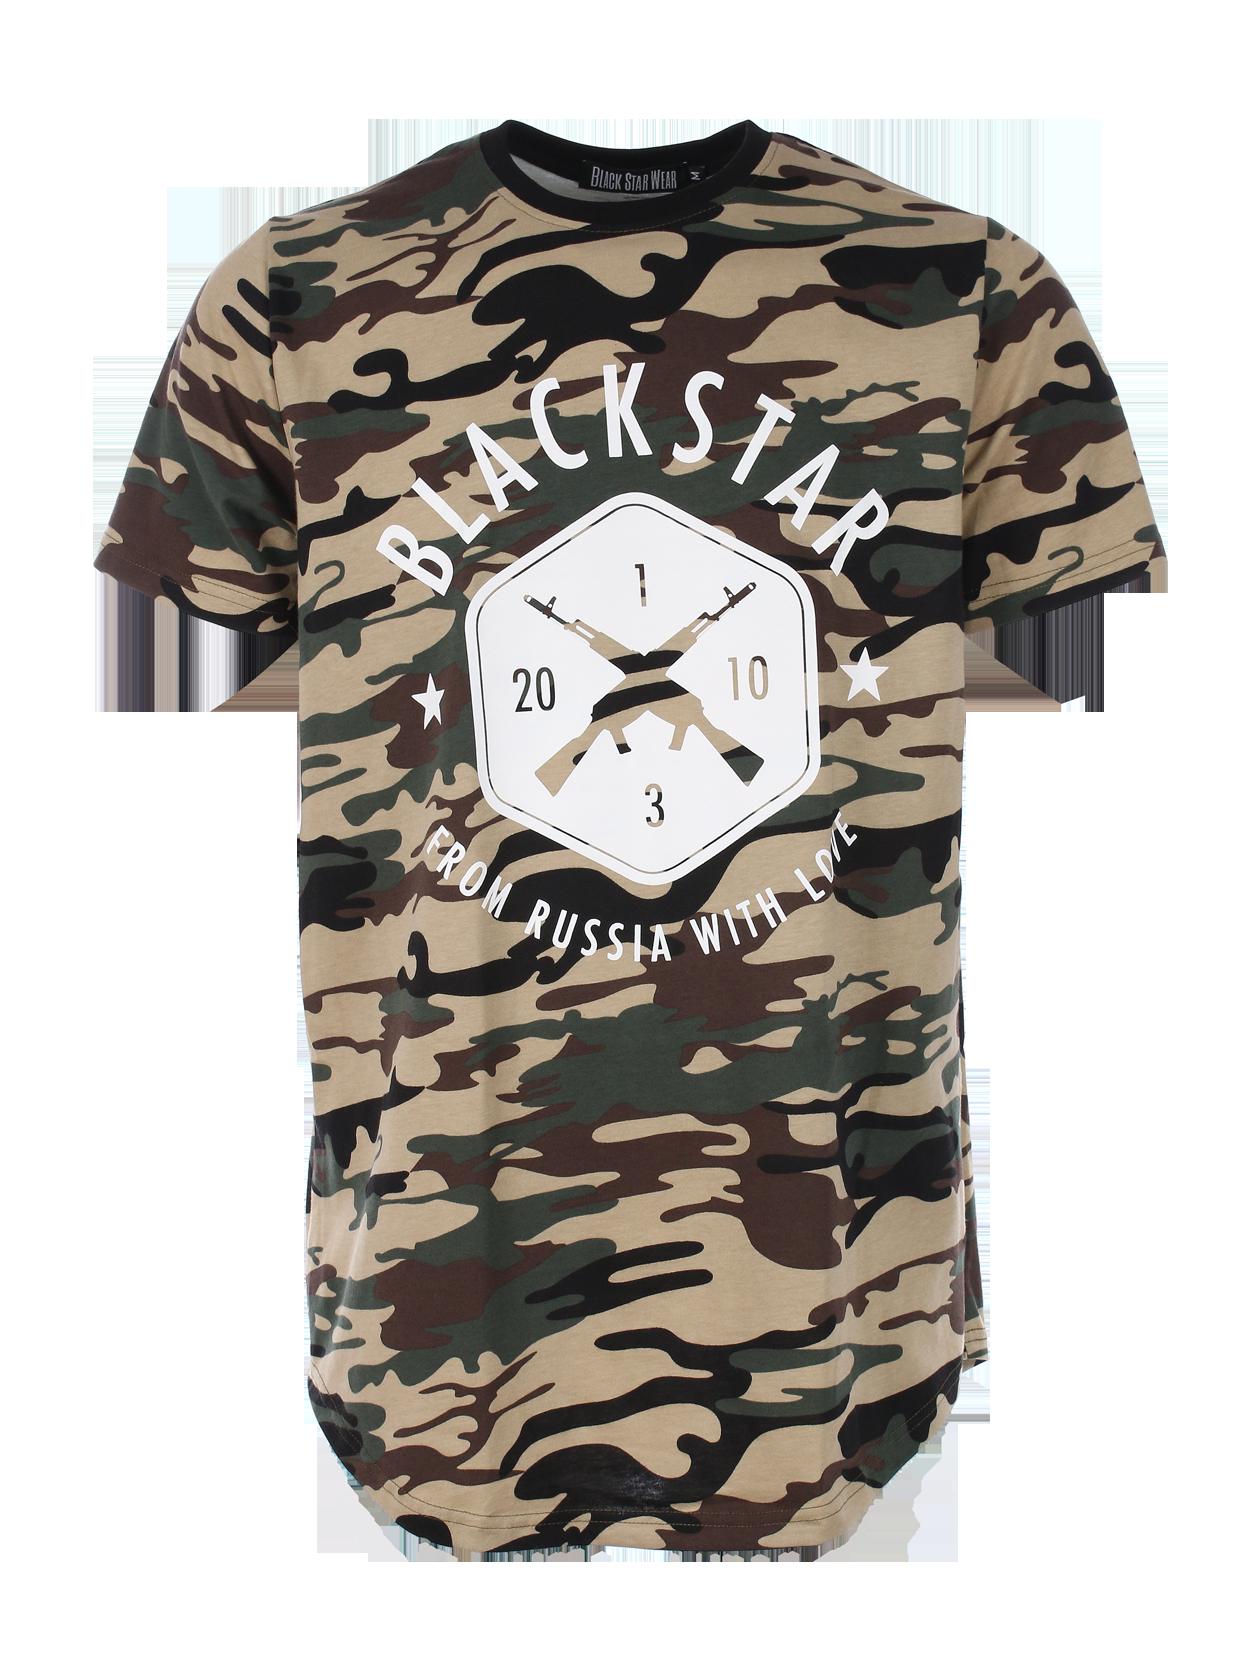 Футболка мужская BLACK + STAR CAMO от Black Star Wear